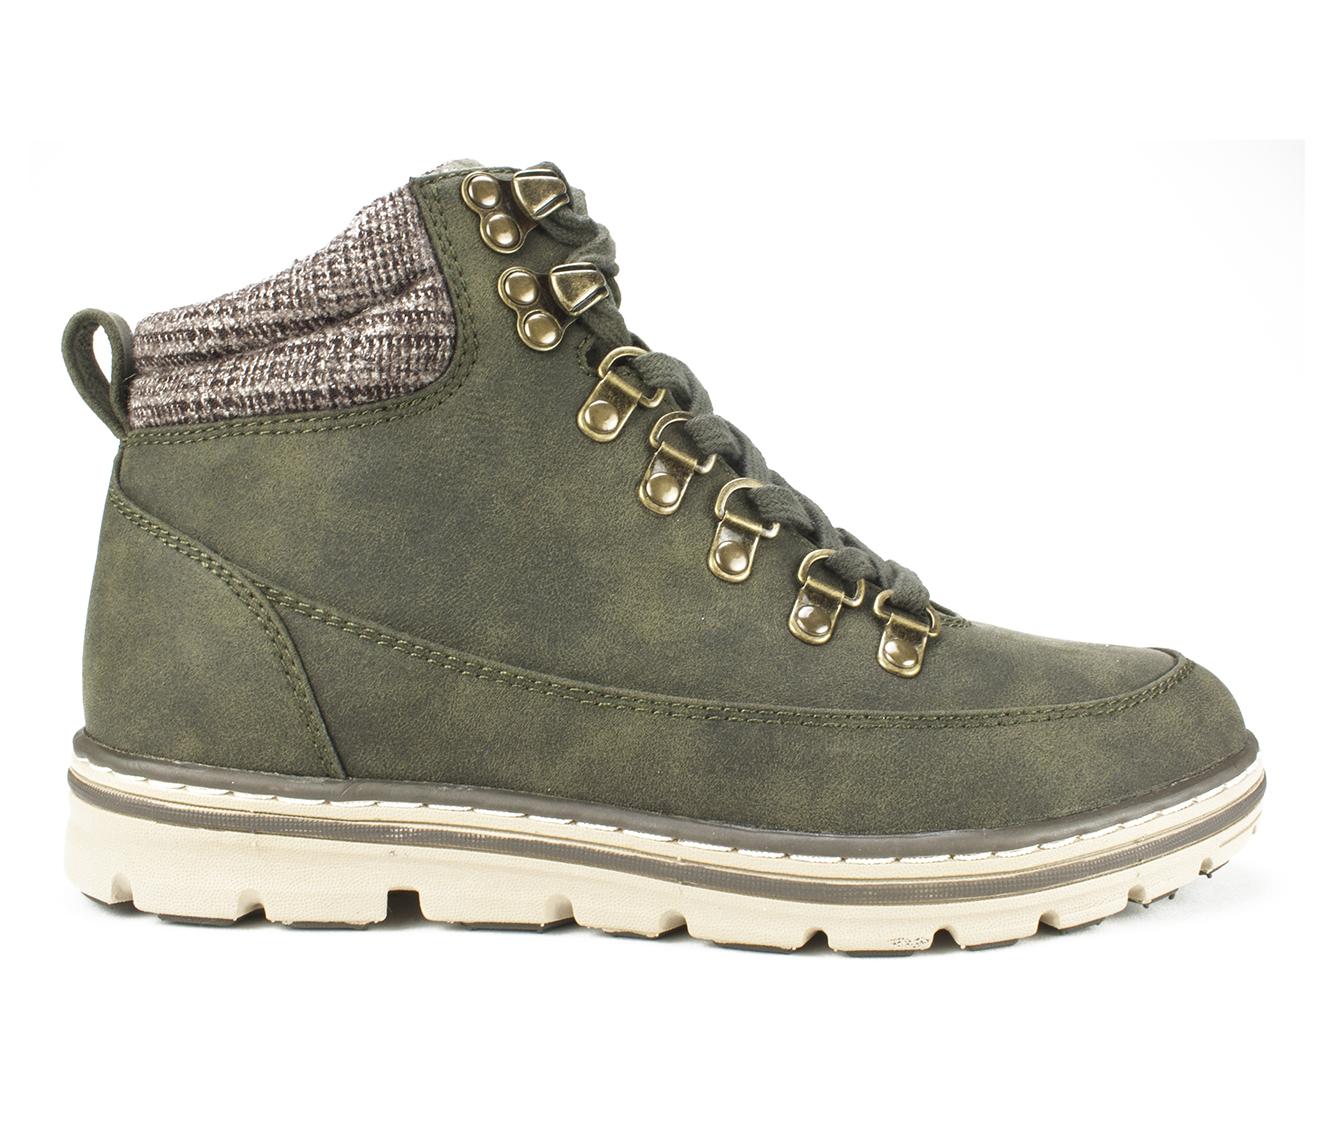 Cliffs Karmen Women's Boot (Green Faux Leather)